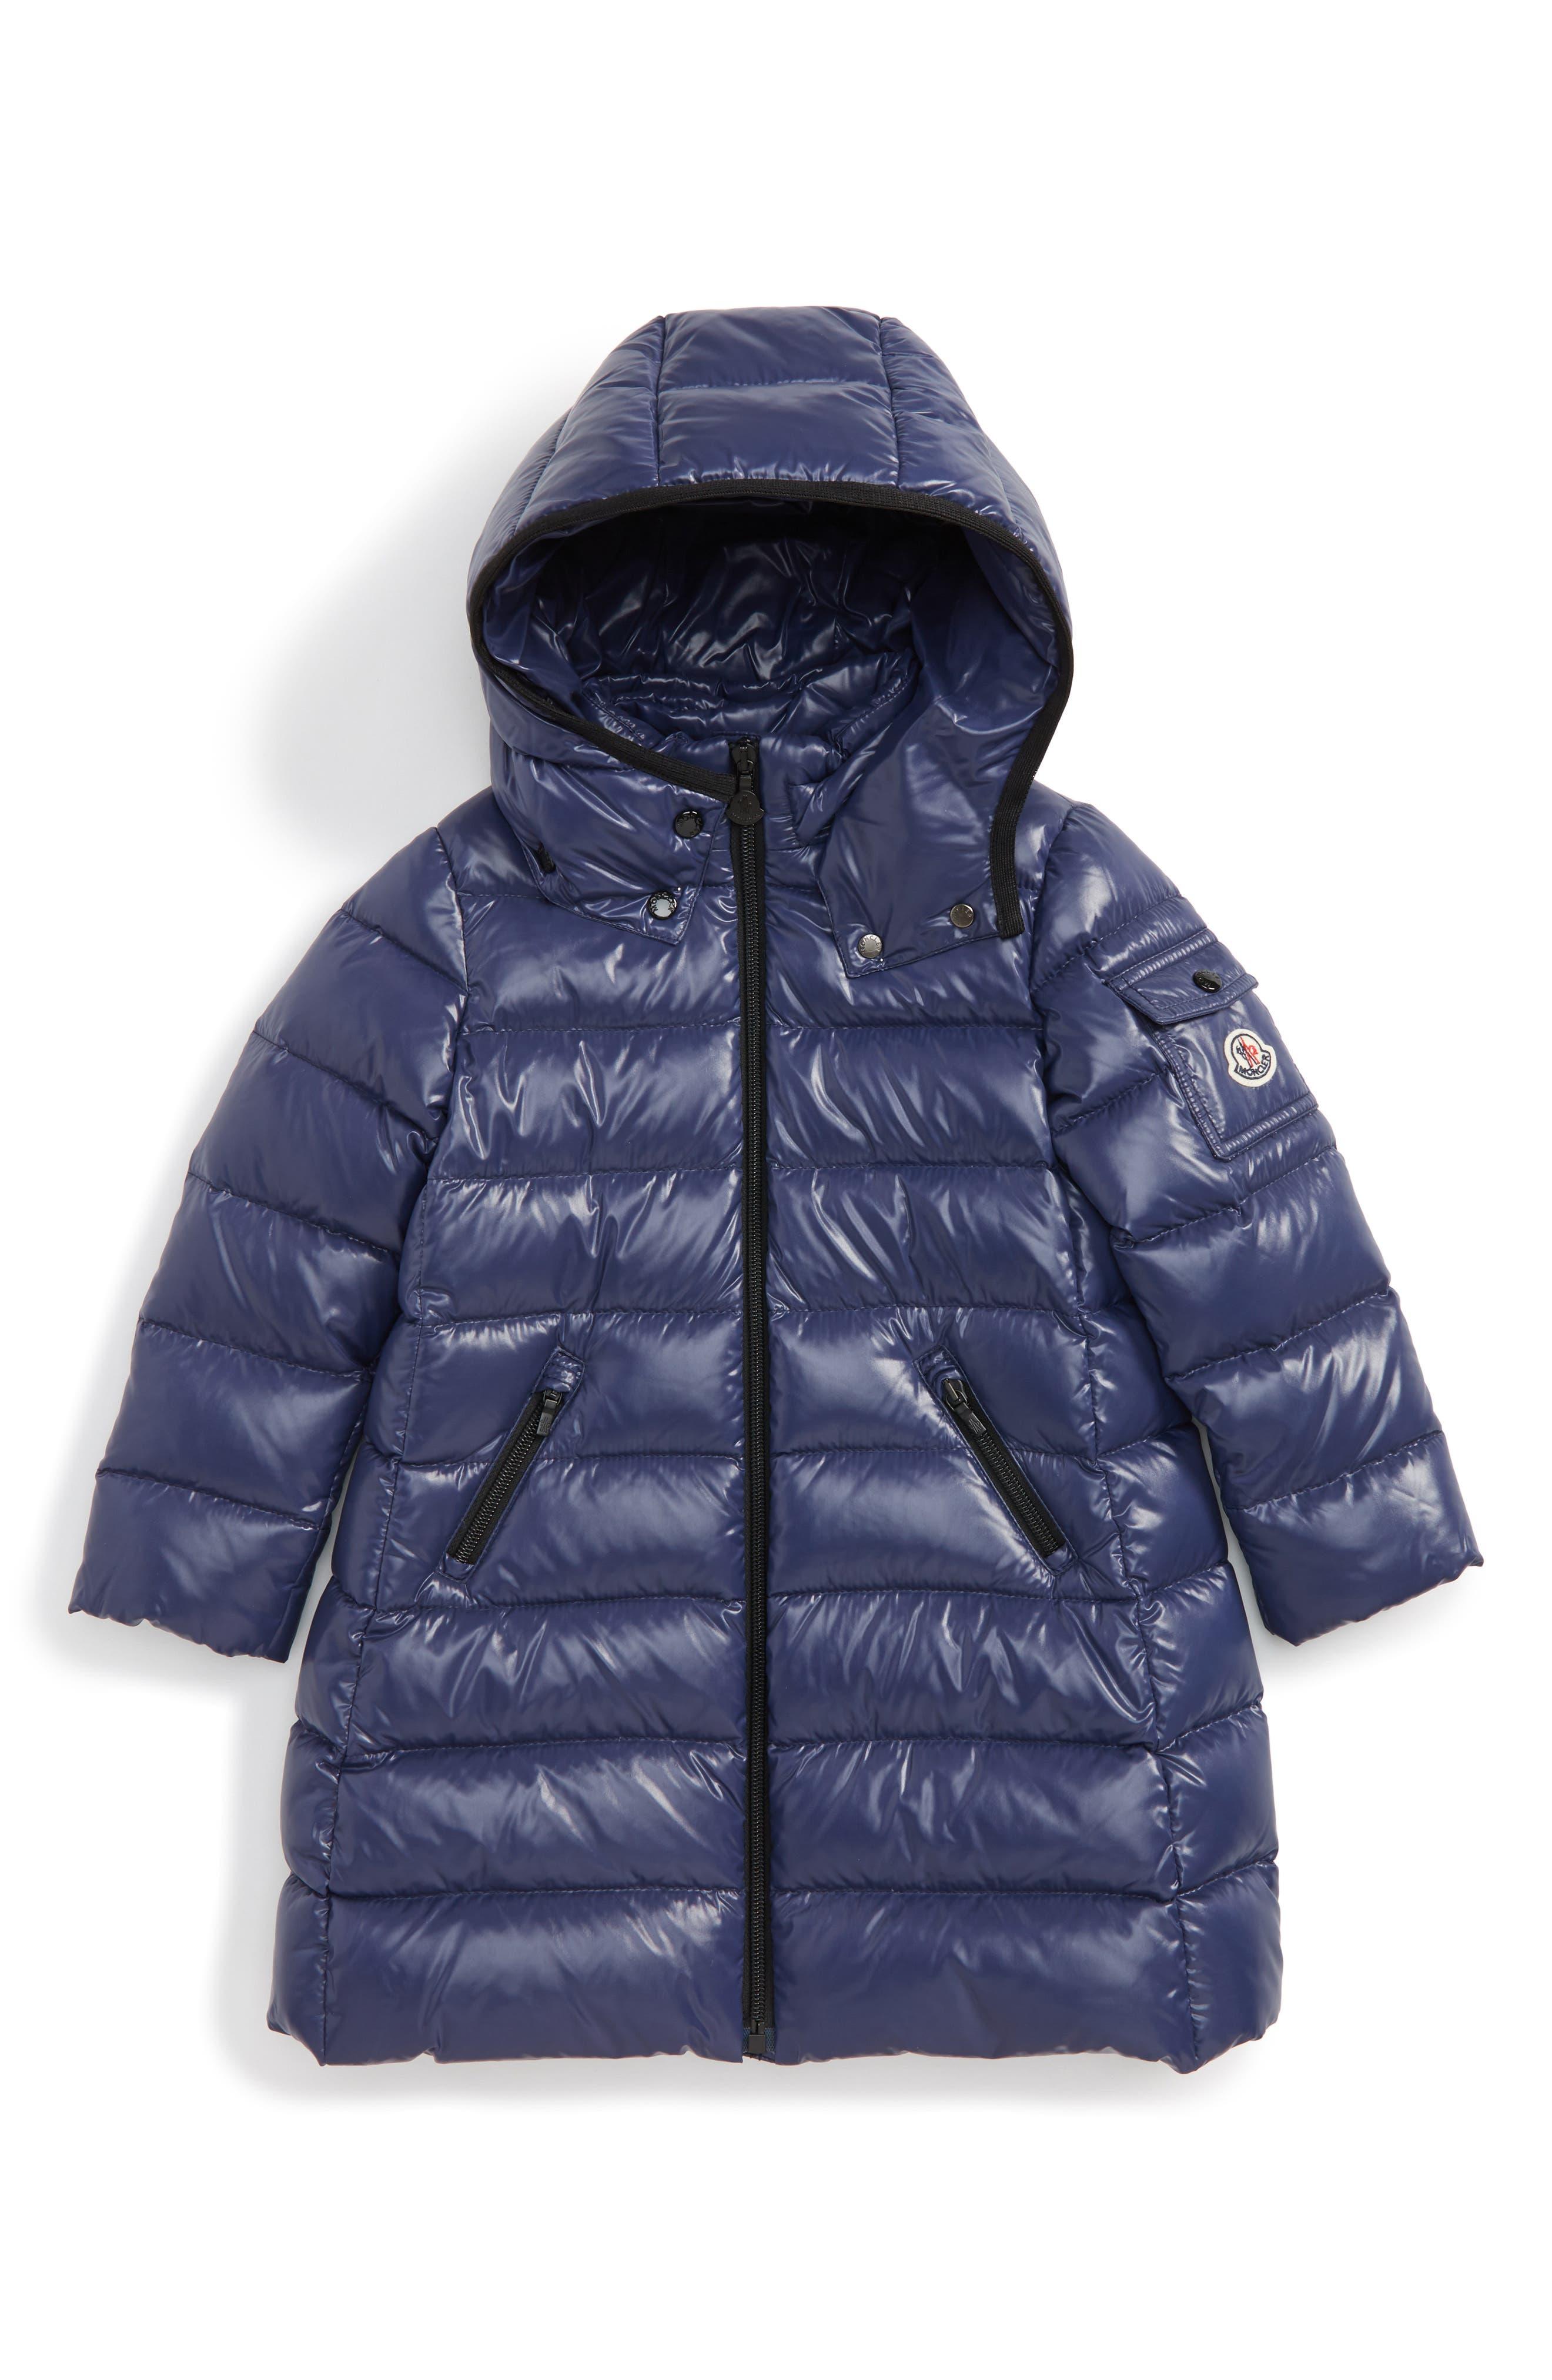 Alternate Image 1 Selected - Moncler Moka Long Hooded Waterproof Down Jacket (Toddler Girls)